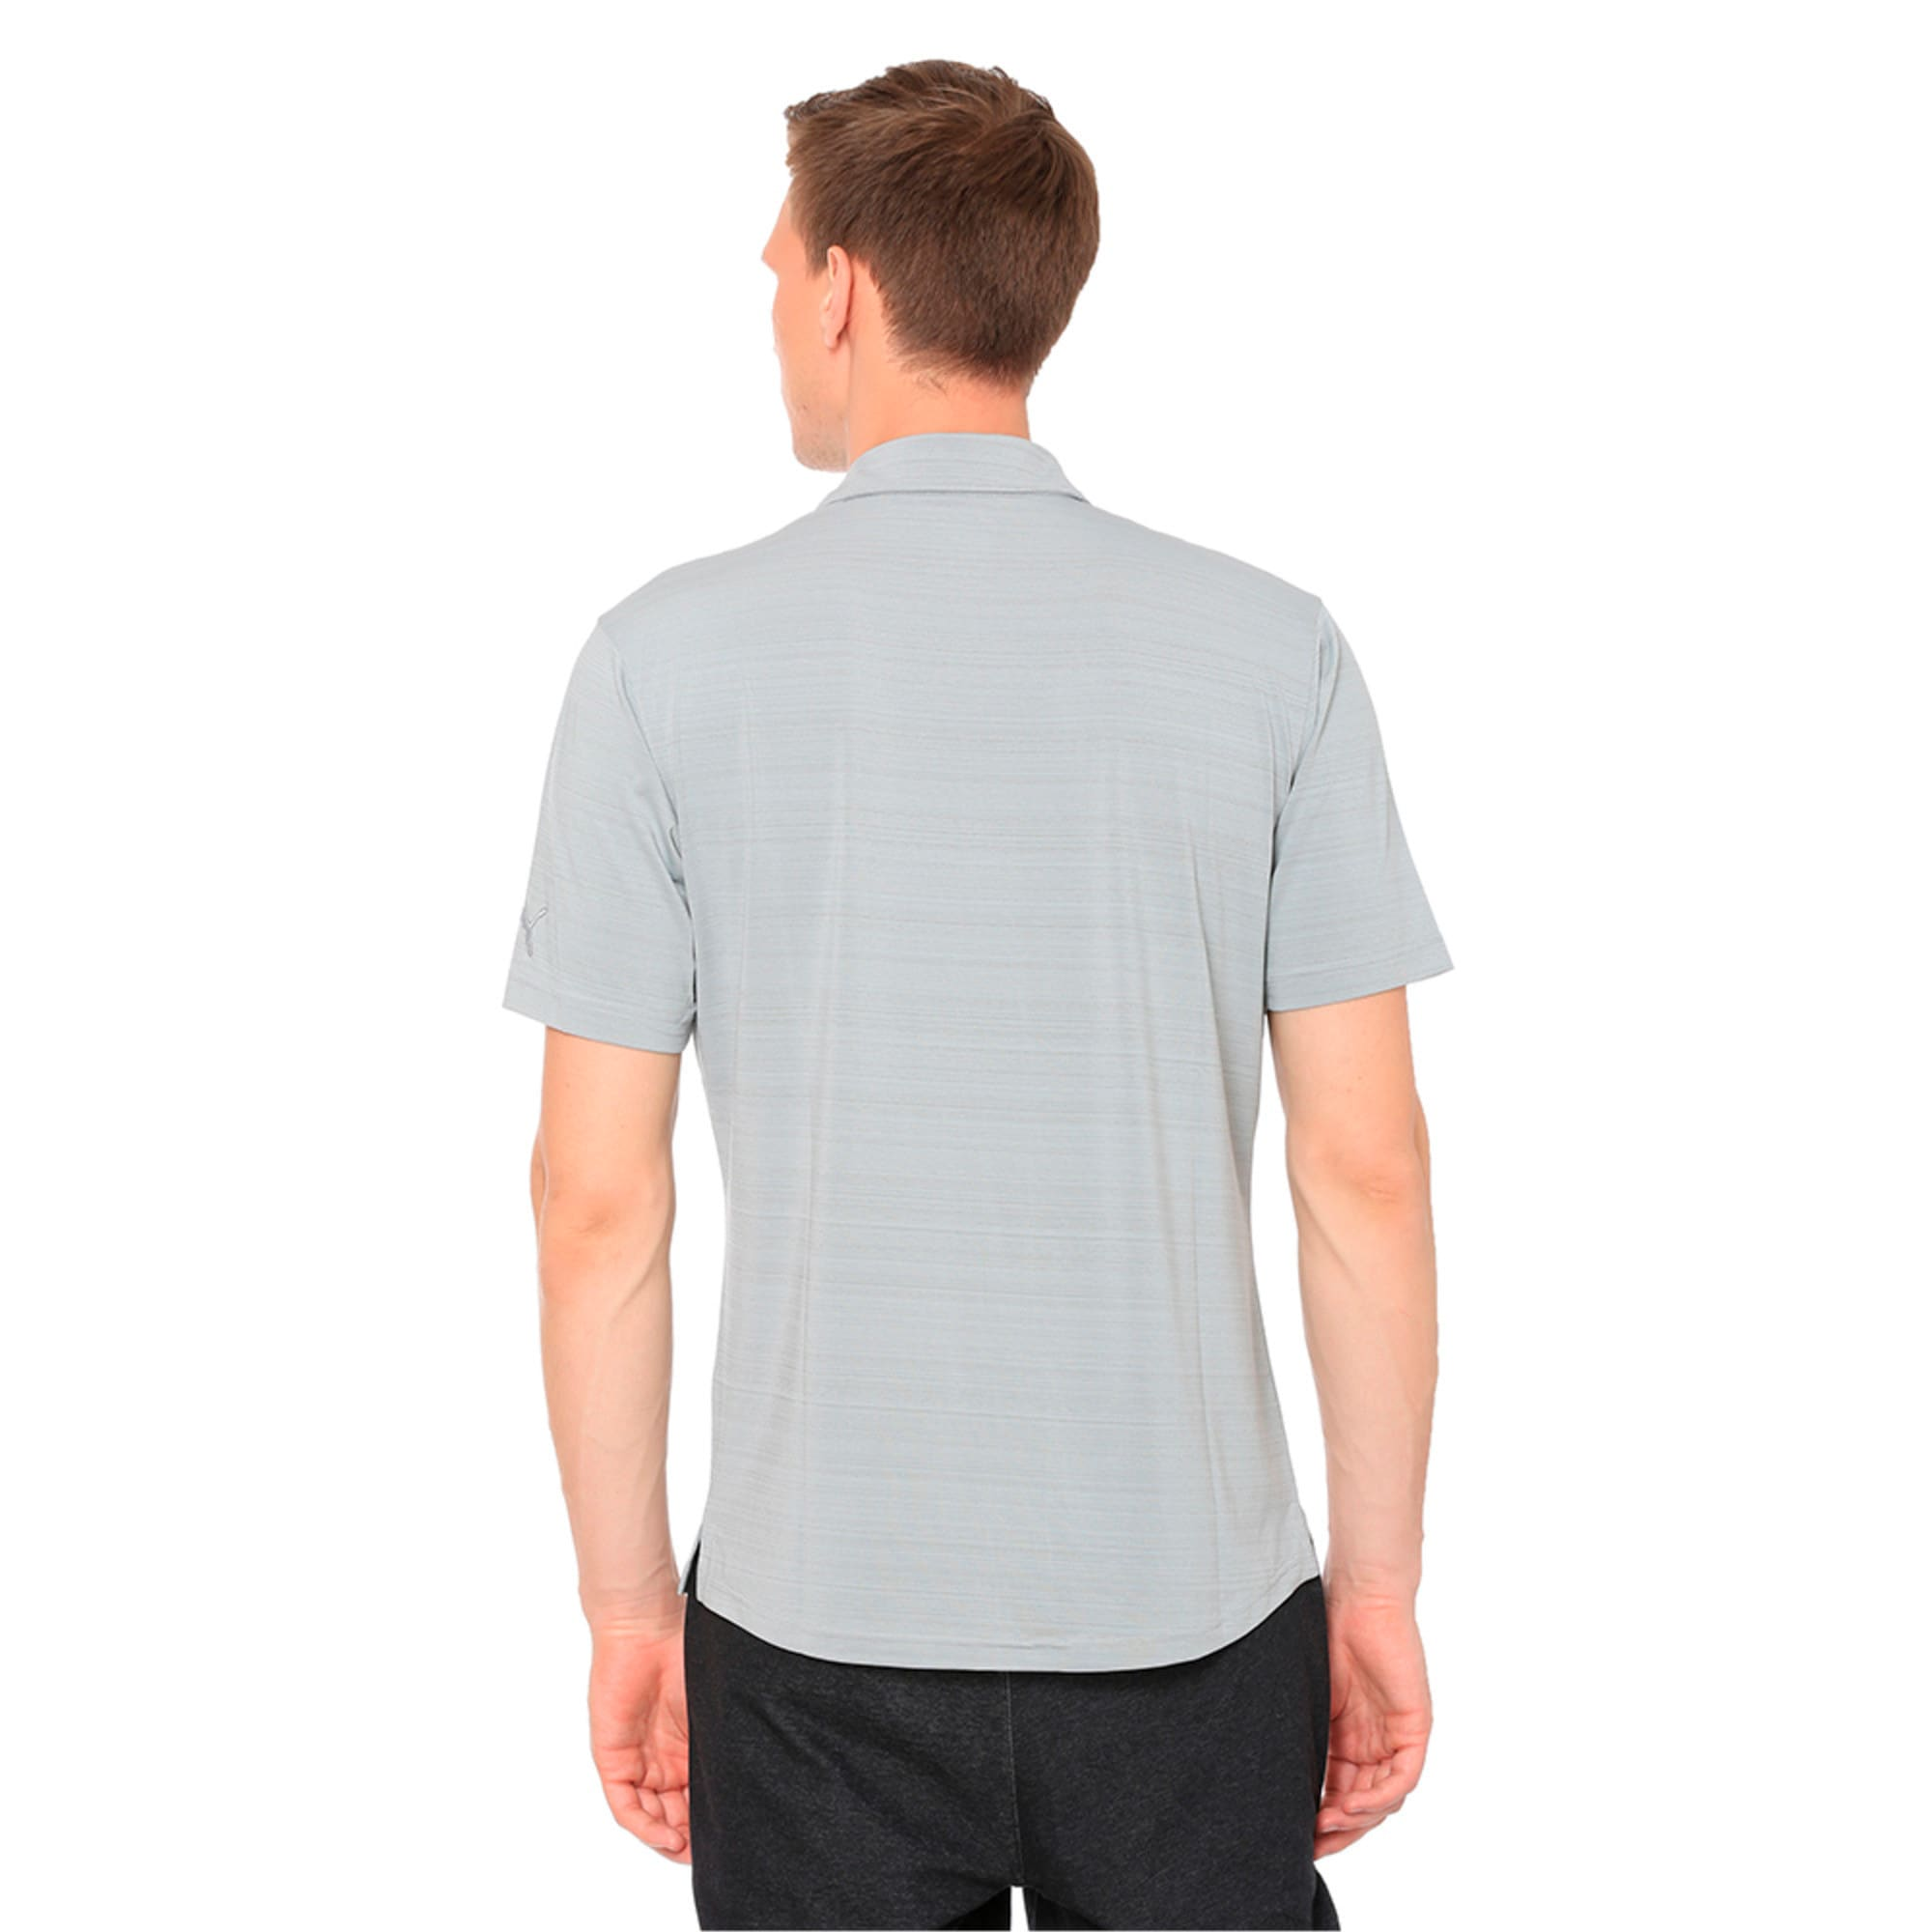 Thumbnail 2 of Breezer Short Sleeve Men's Golf Shirt, Quarry, medium-IND